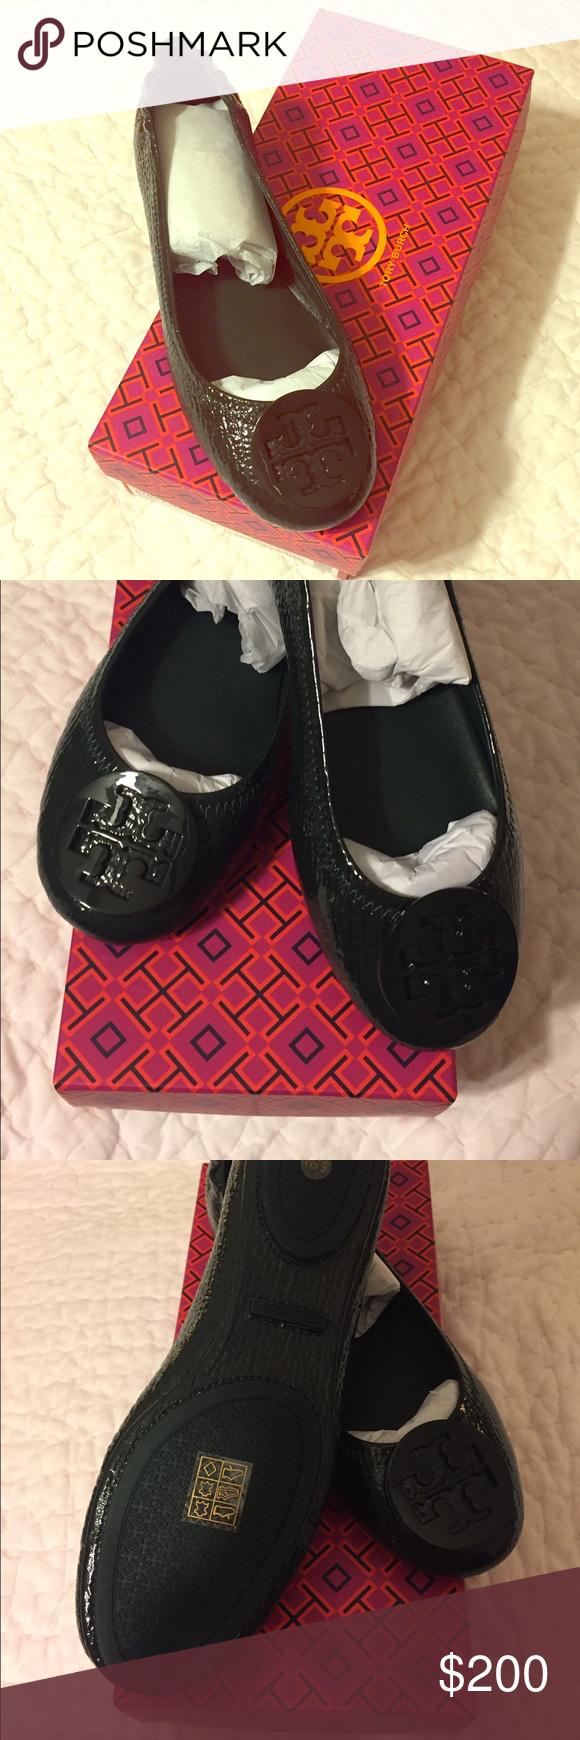 4dd873c55469 New! Tory Burch Minnie Travel Ballet -Jitney Green New! Never worn ...